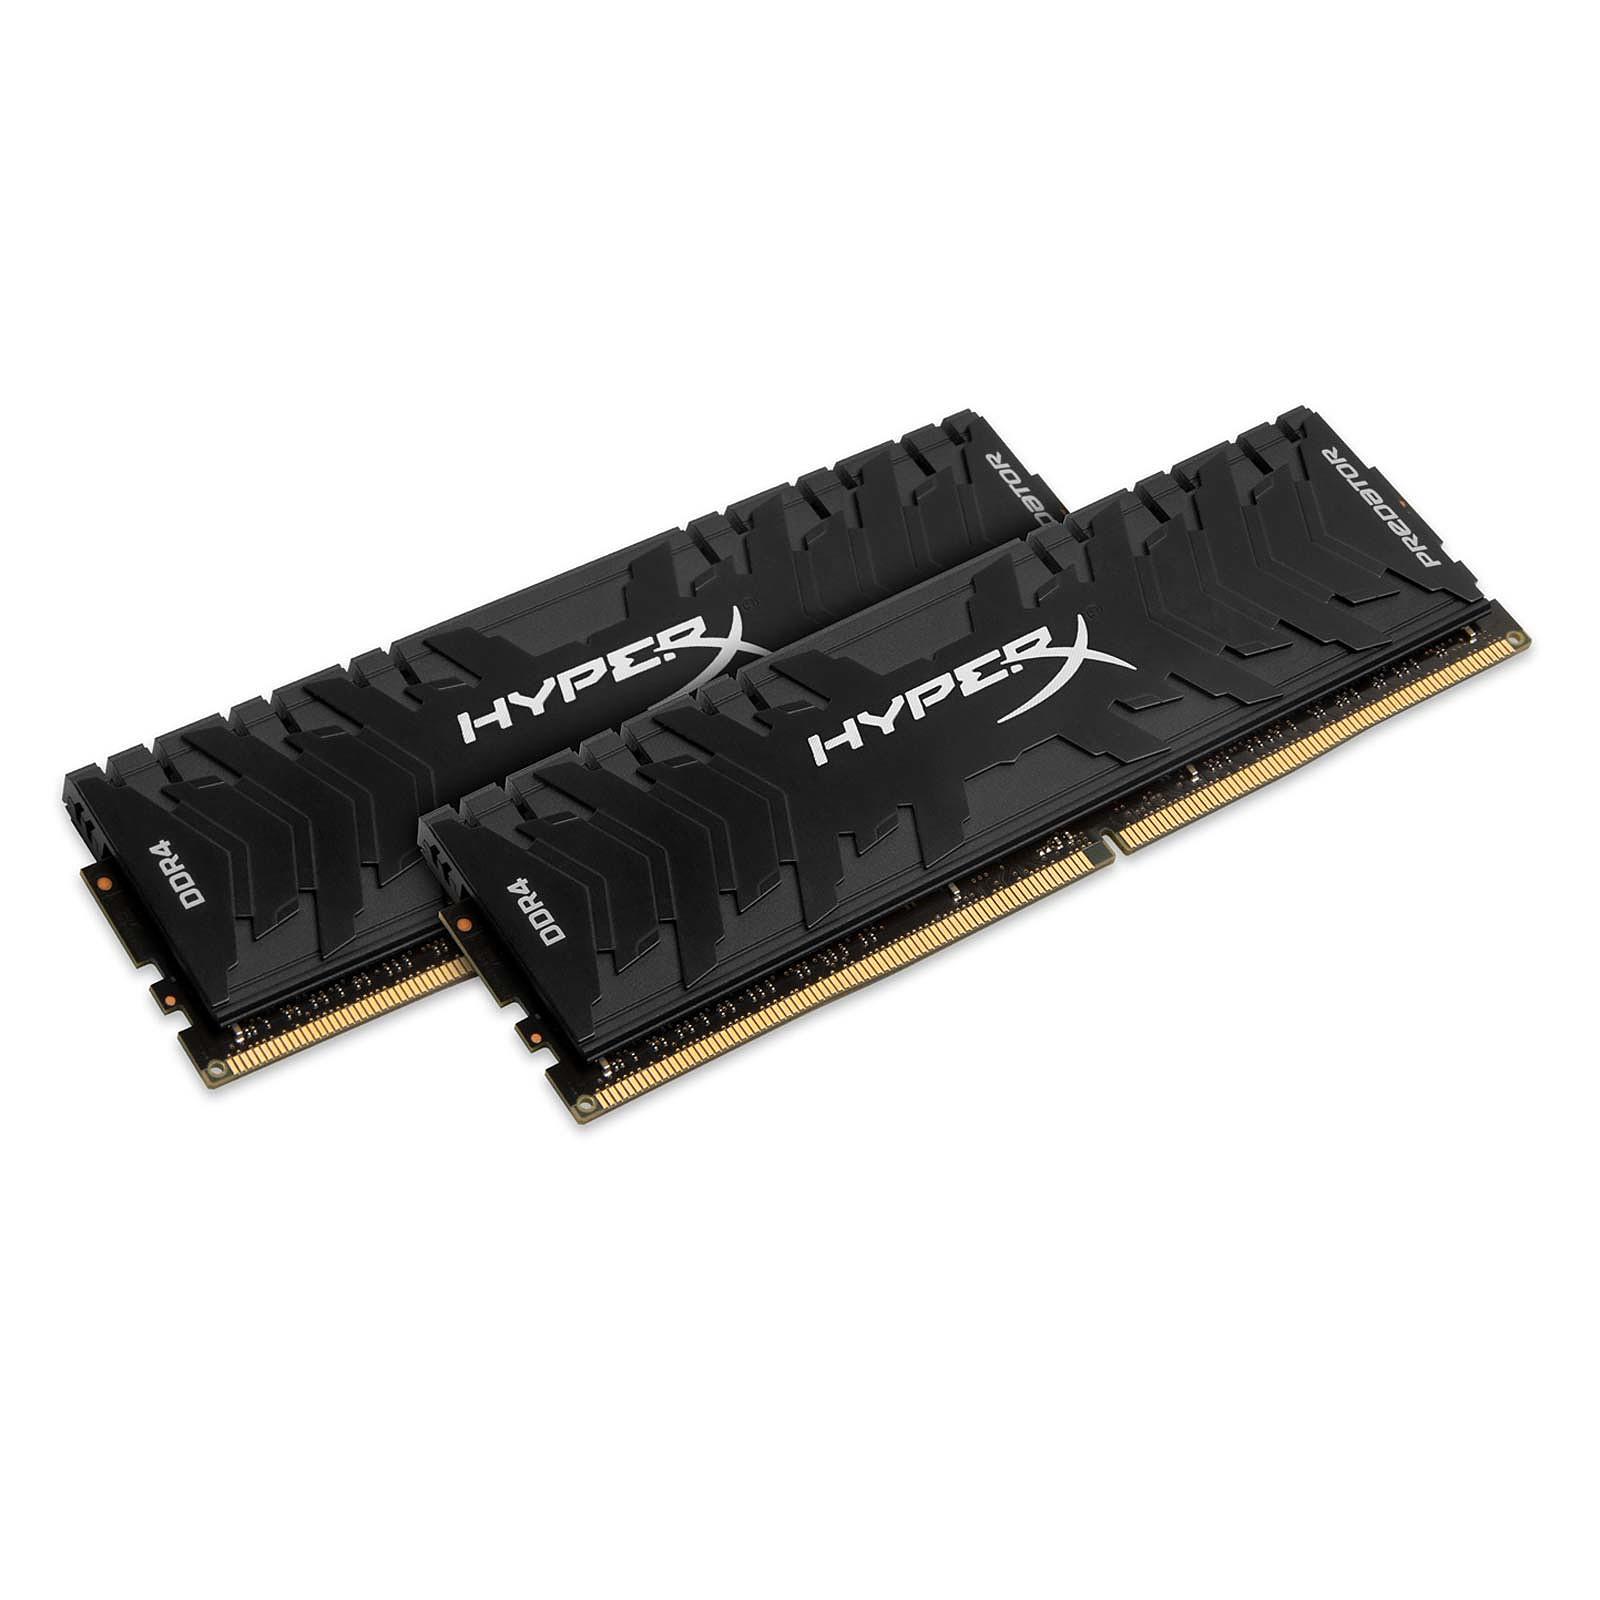 HyperX Predator Noir 16 Go (2x 8 Go) DDR4 3200 MHz CL16